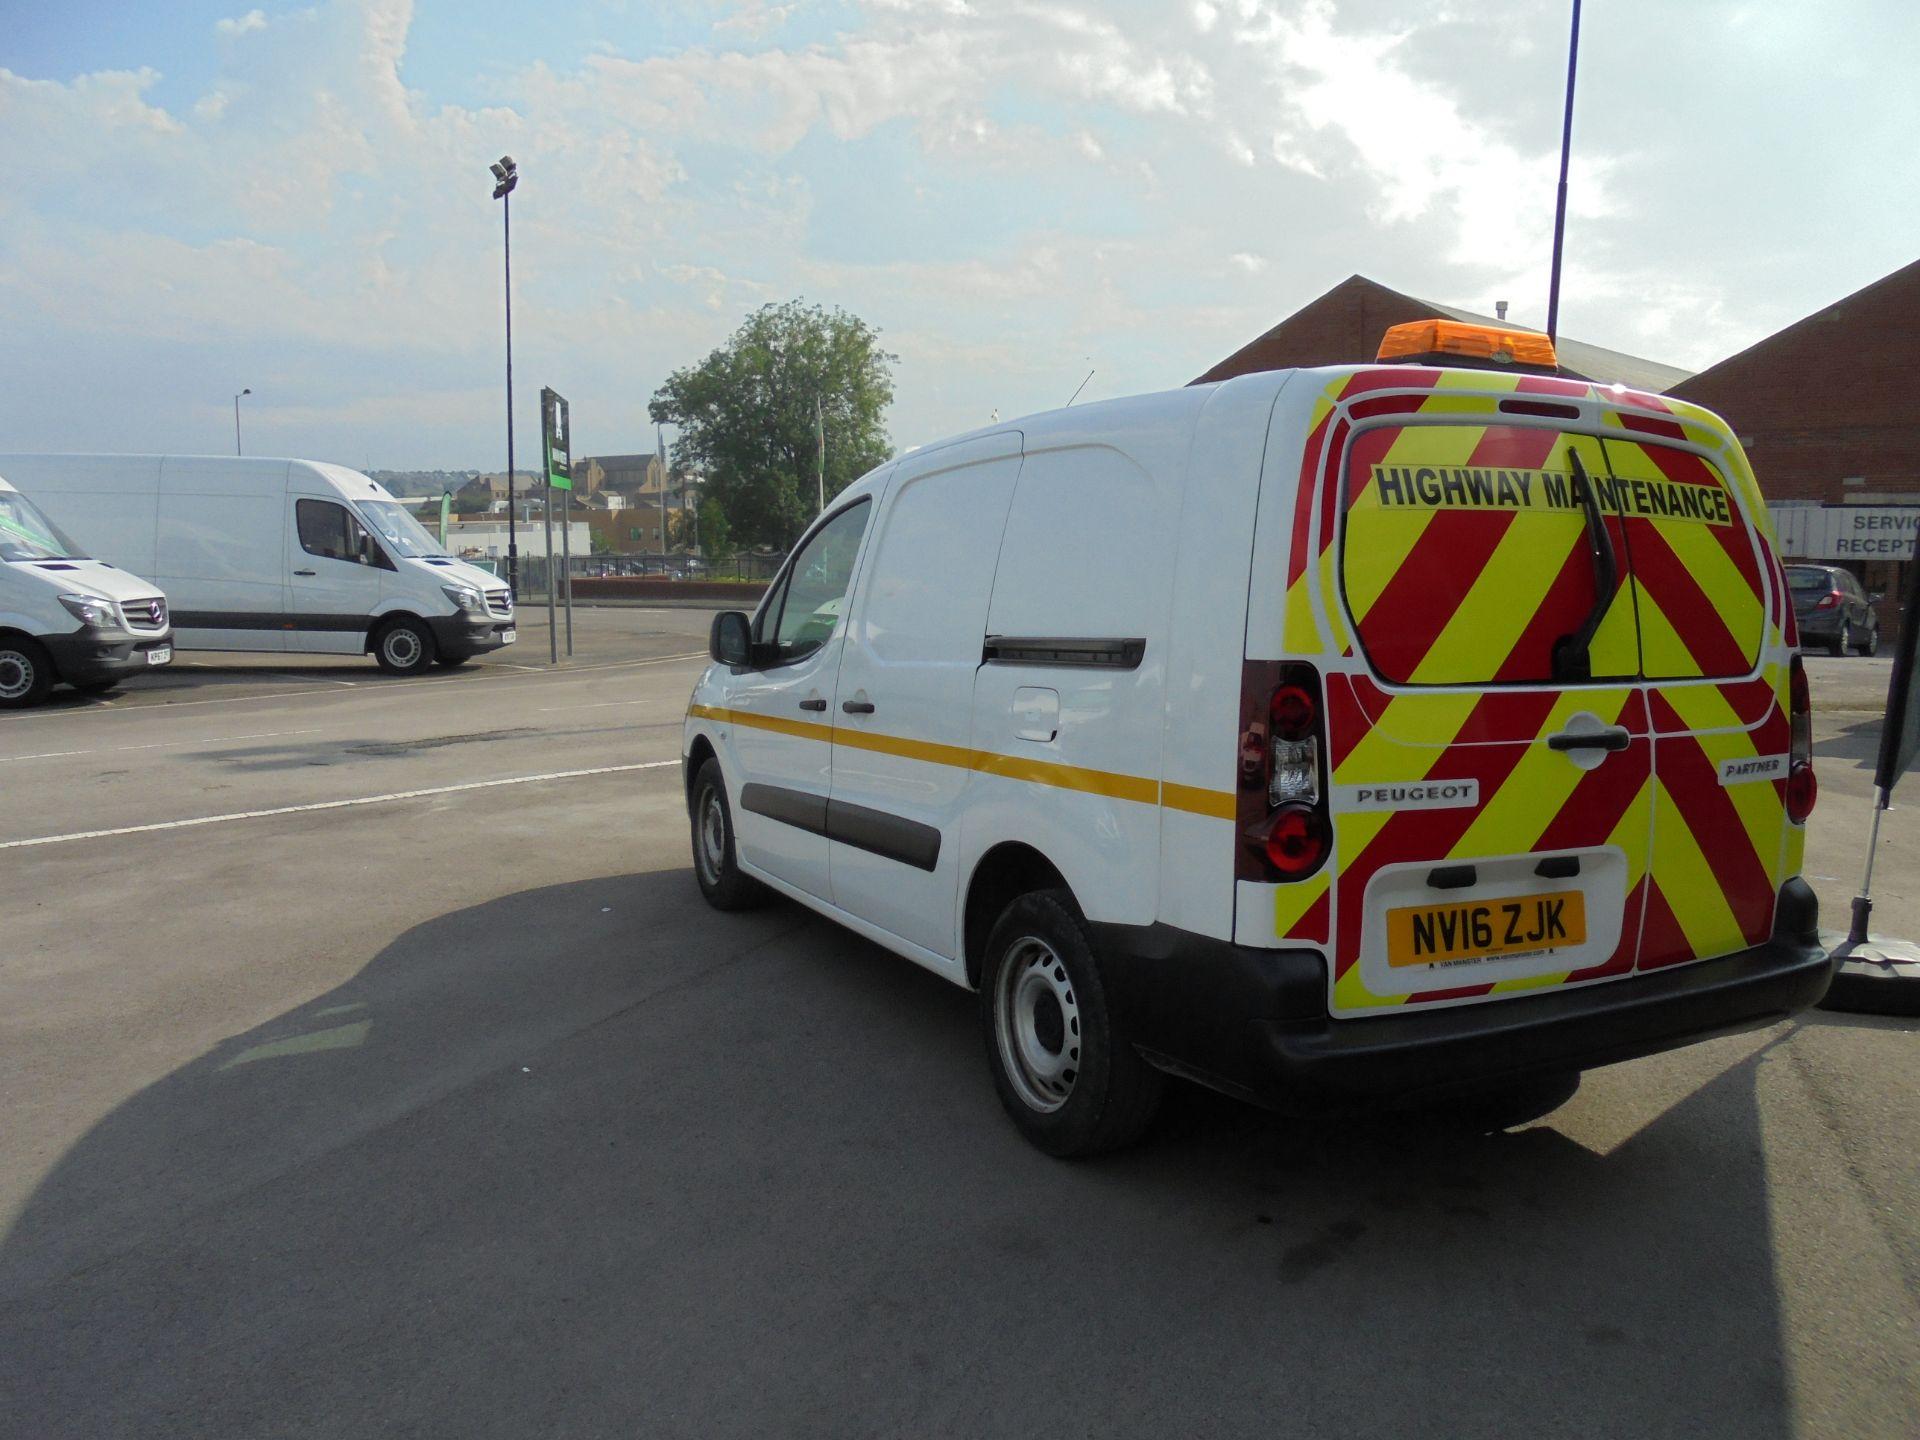 2016 Peugeot Partner 715 S 1.6 Hdi 92 Crew Van (NV16ZJK) Image 10